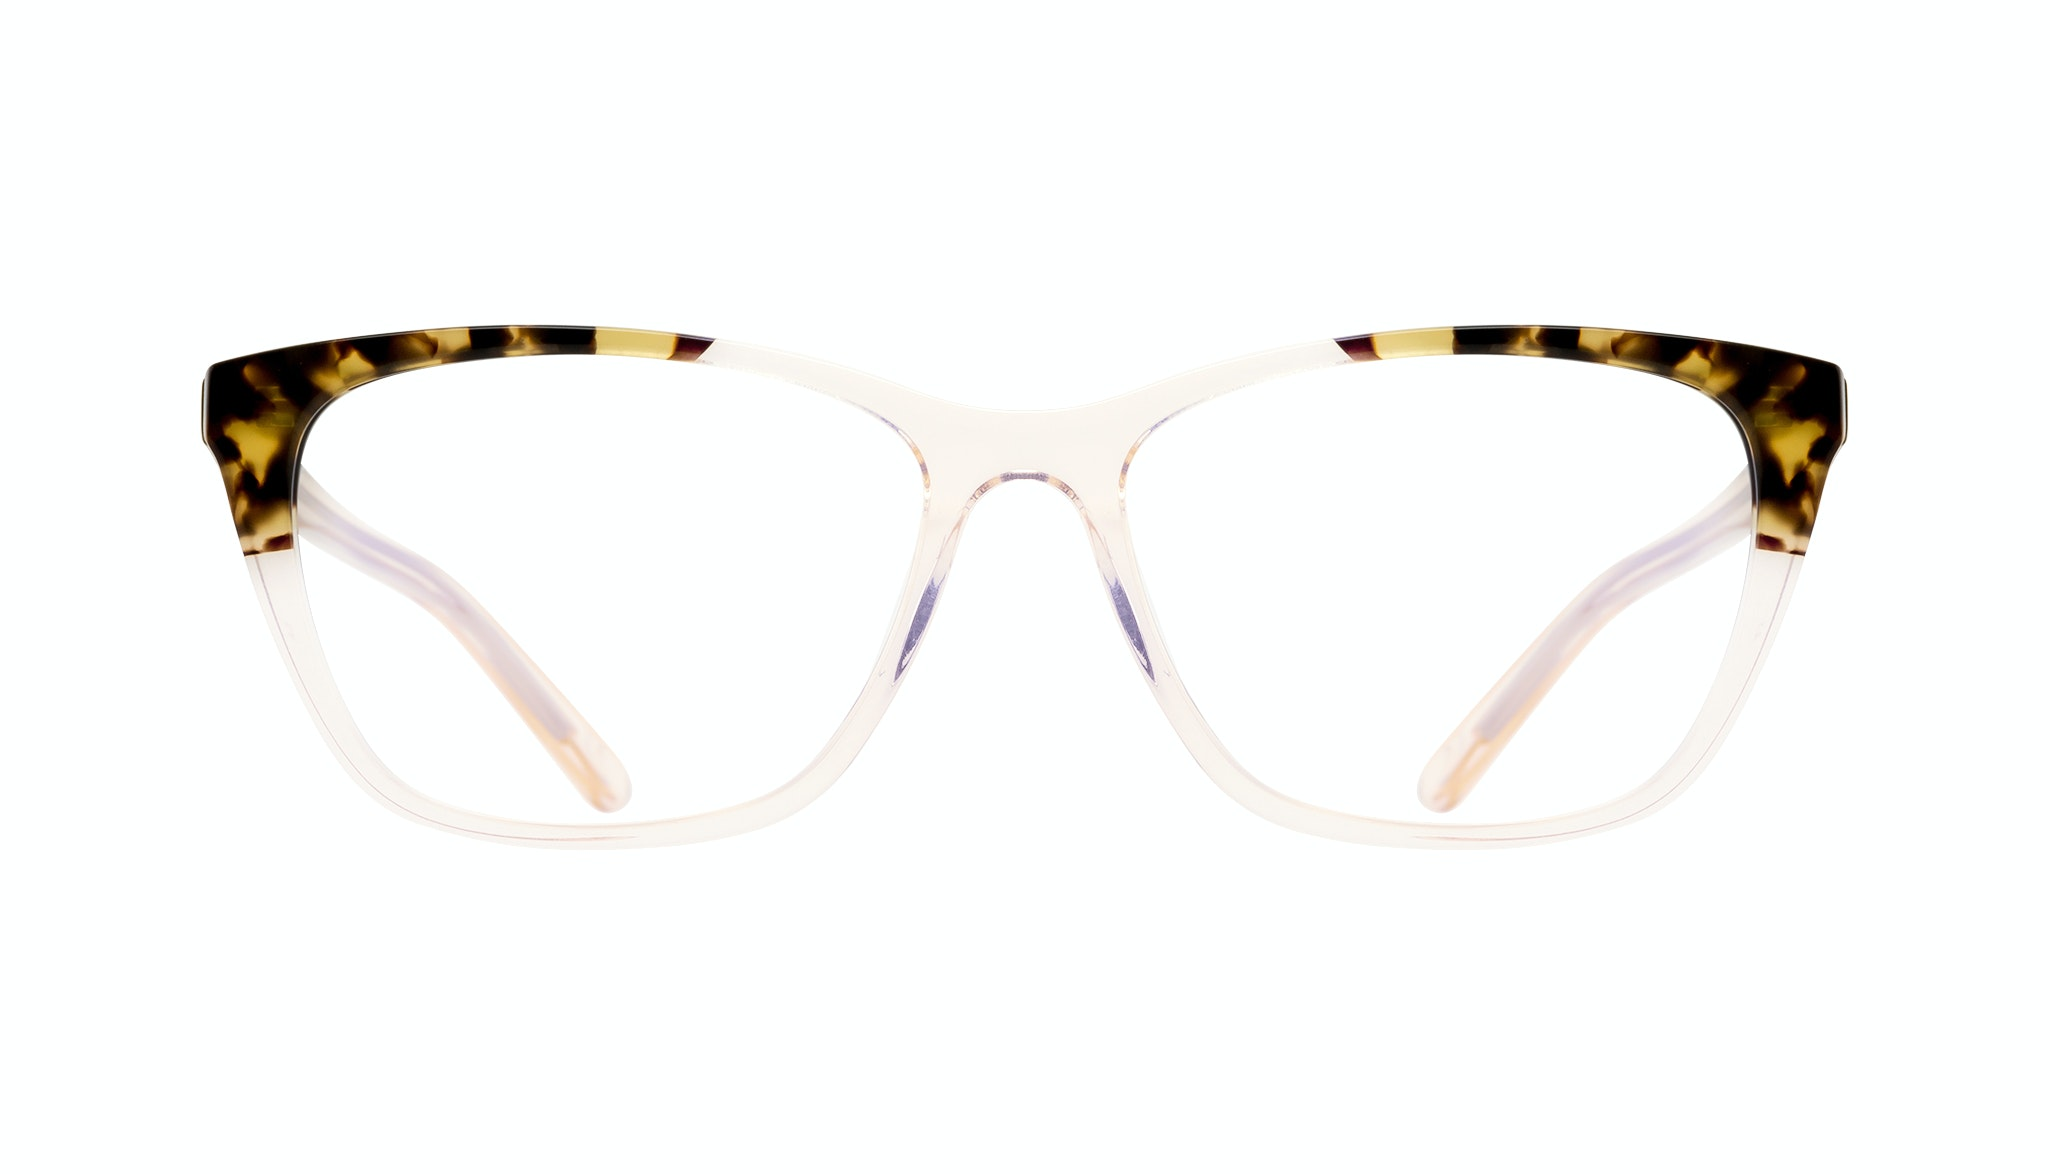 Affordable Fashion Glasses Cat Eye Rectangle Eyeglasses Women Myrtle Blond Tortoise